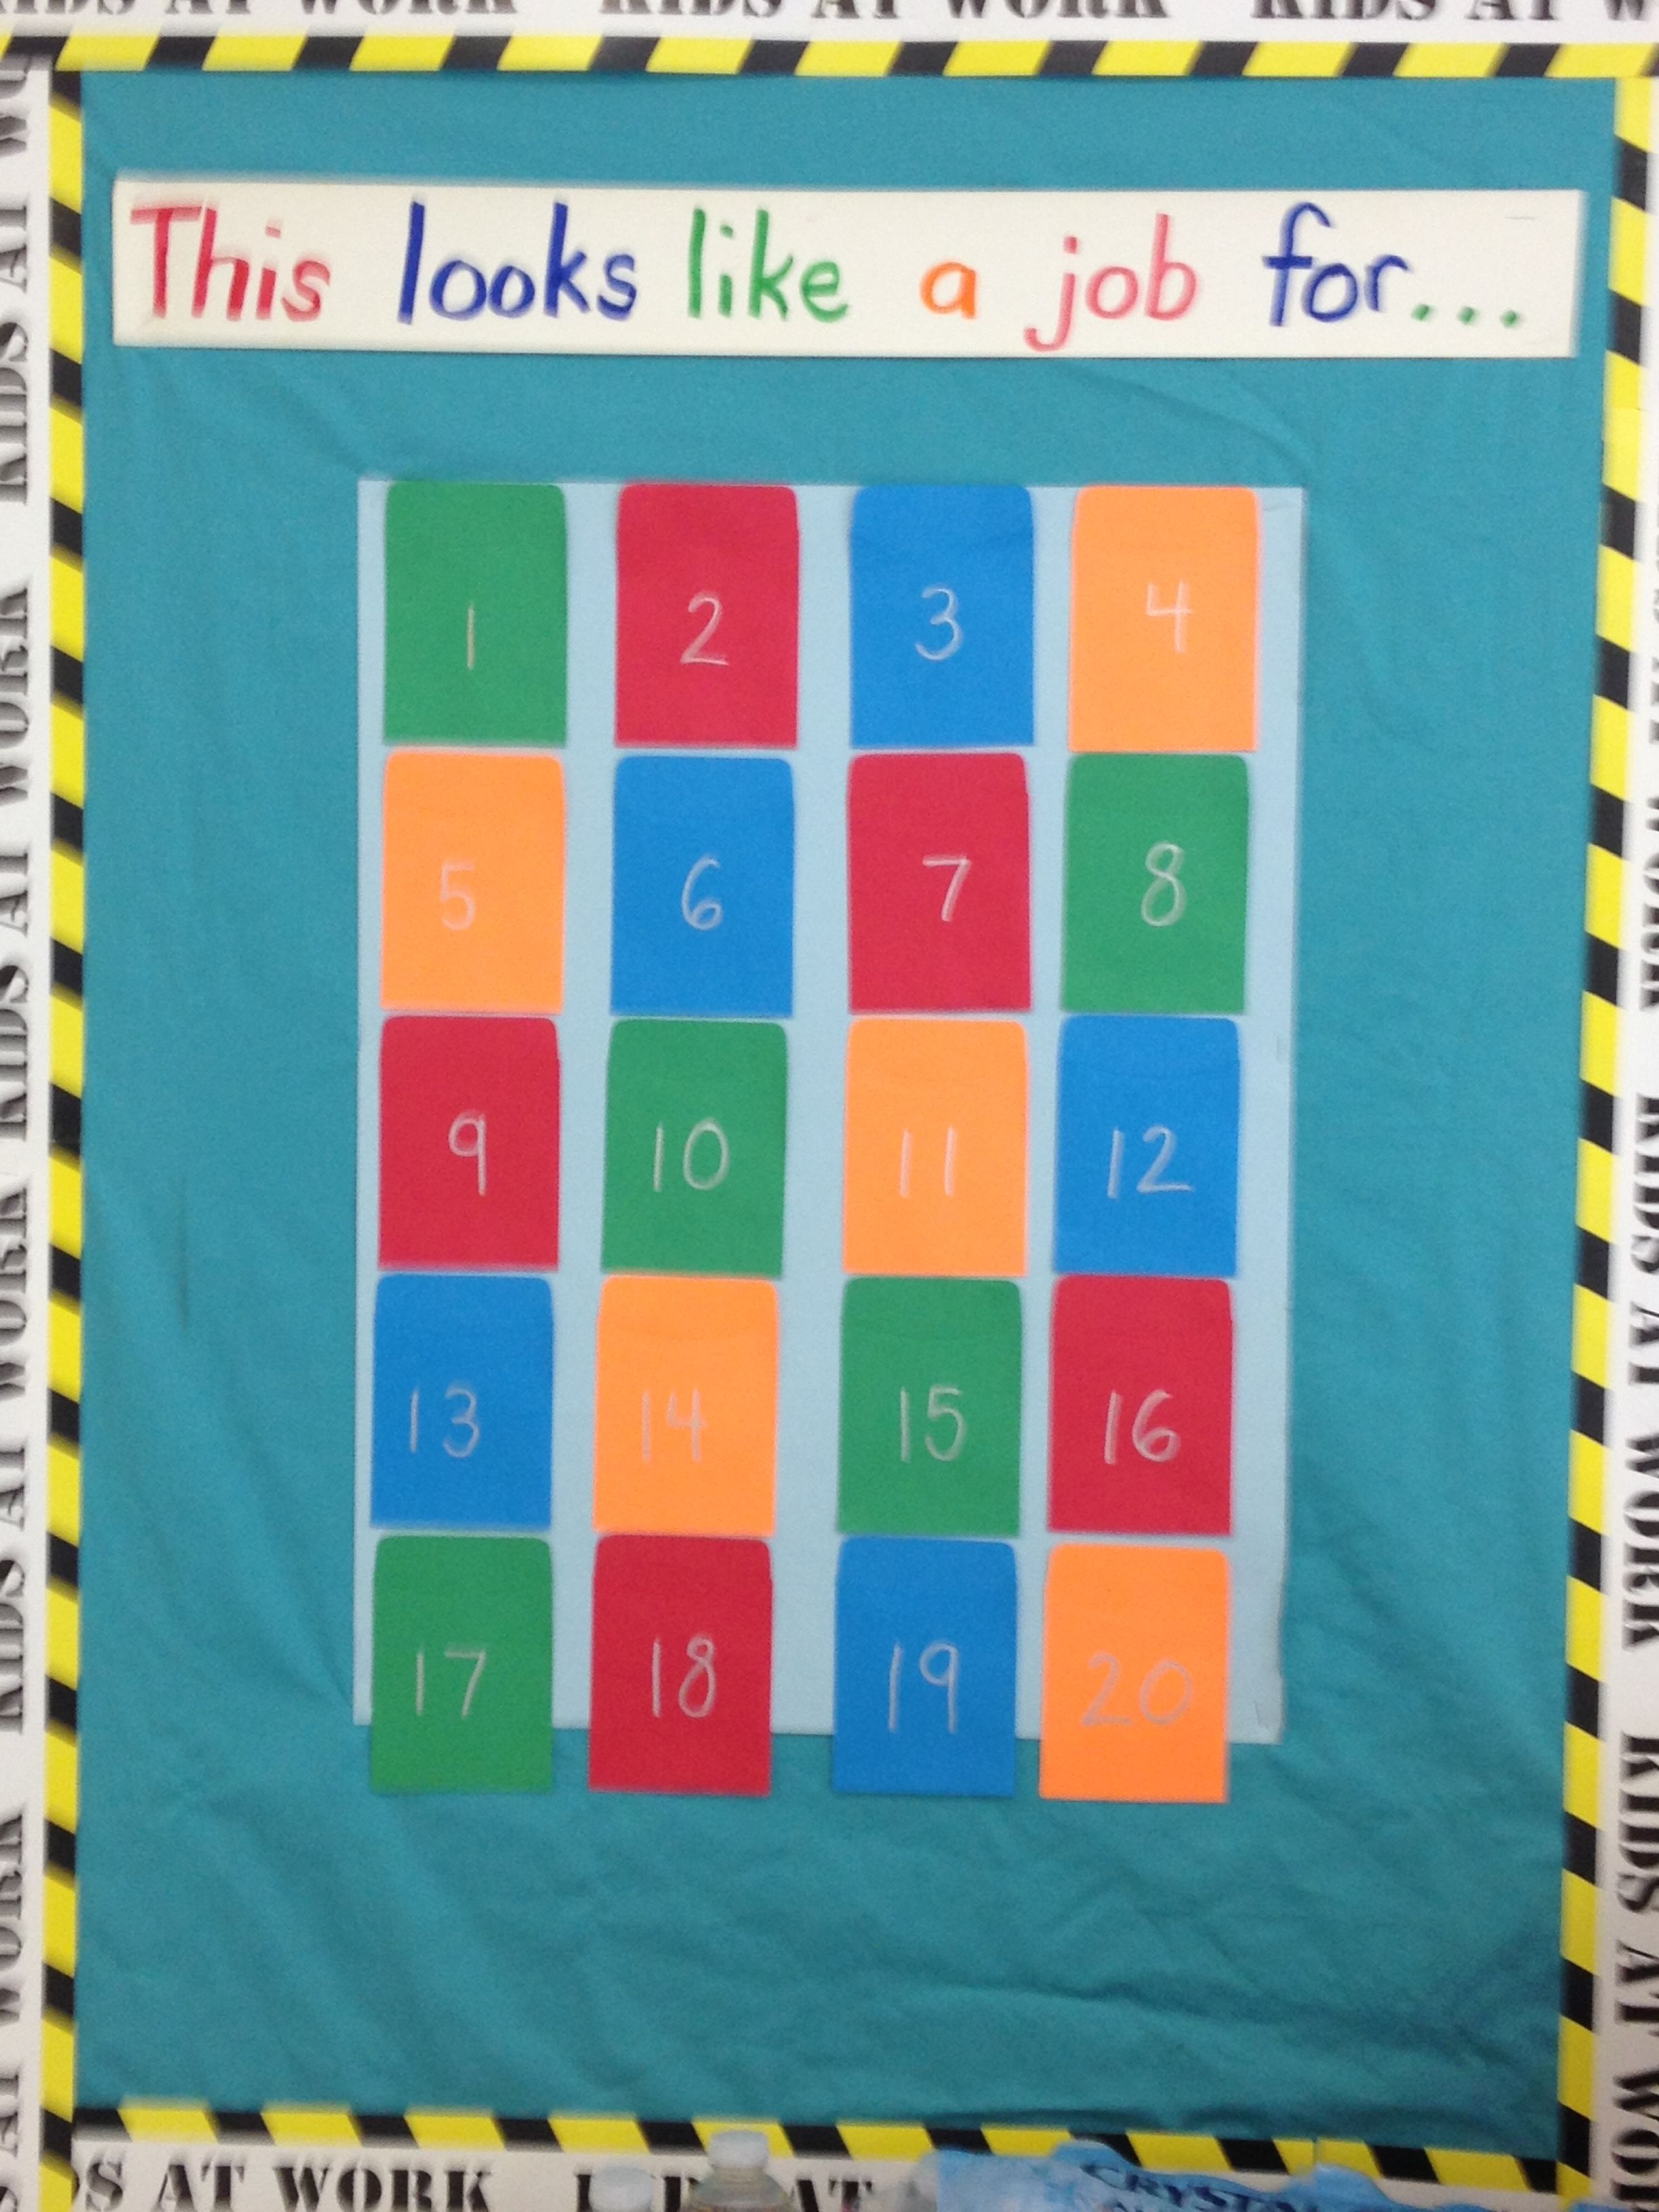 Superhero classroom theme job chart.